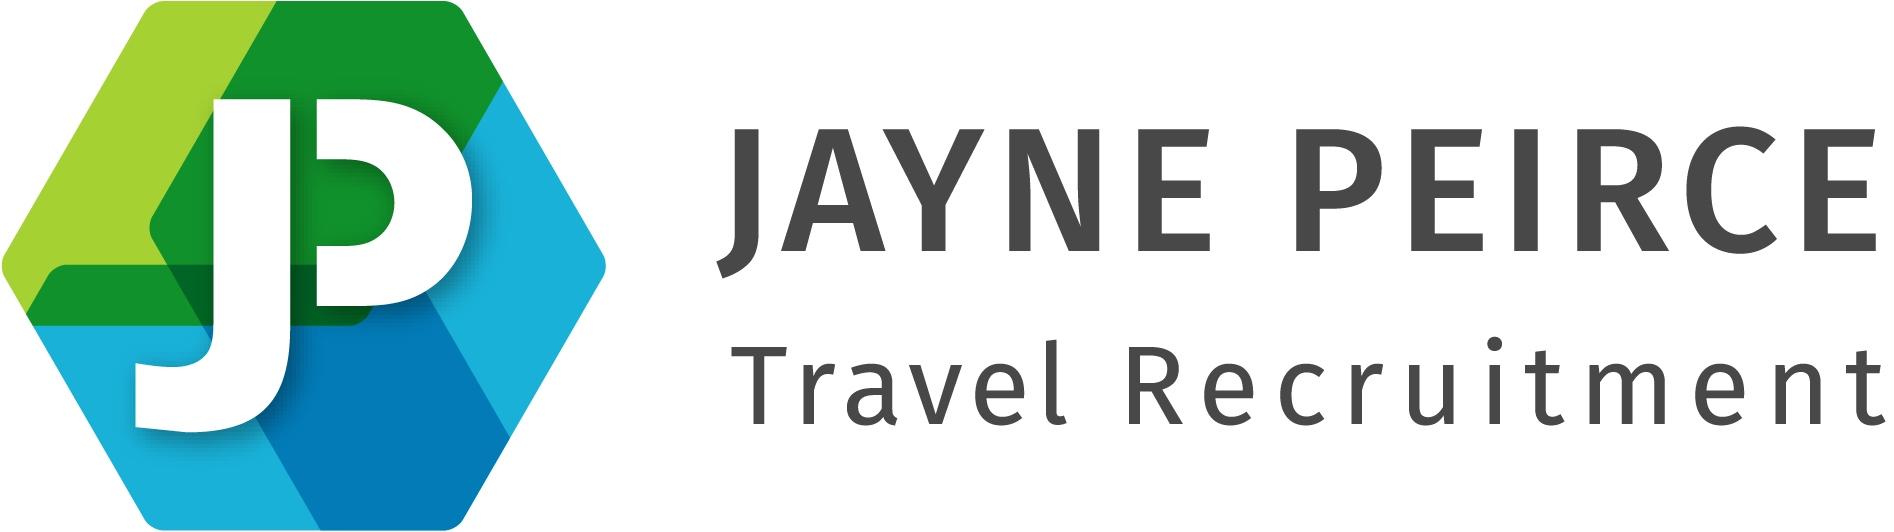 Jayne Peirce Travel Recruitment